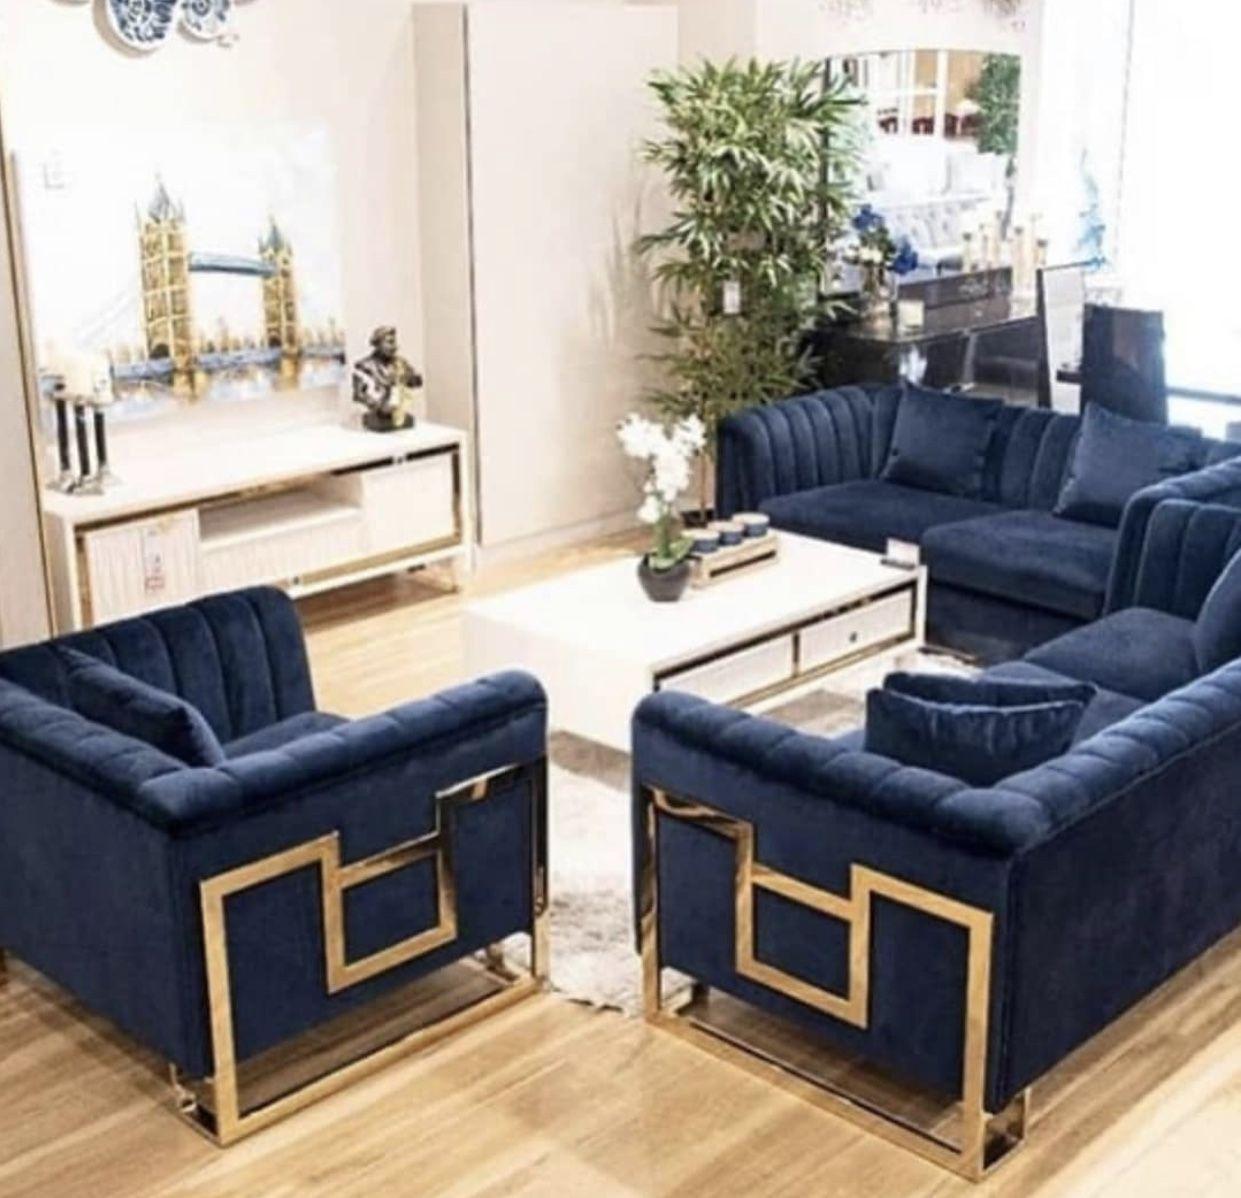 Pin By Re0o0ry ه م س ات ع اب ر ة On Home Furnitures أثاث المنزل Furniture Home Home Decor